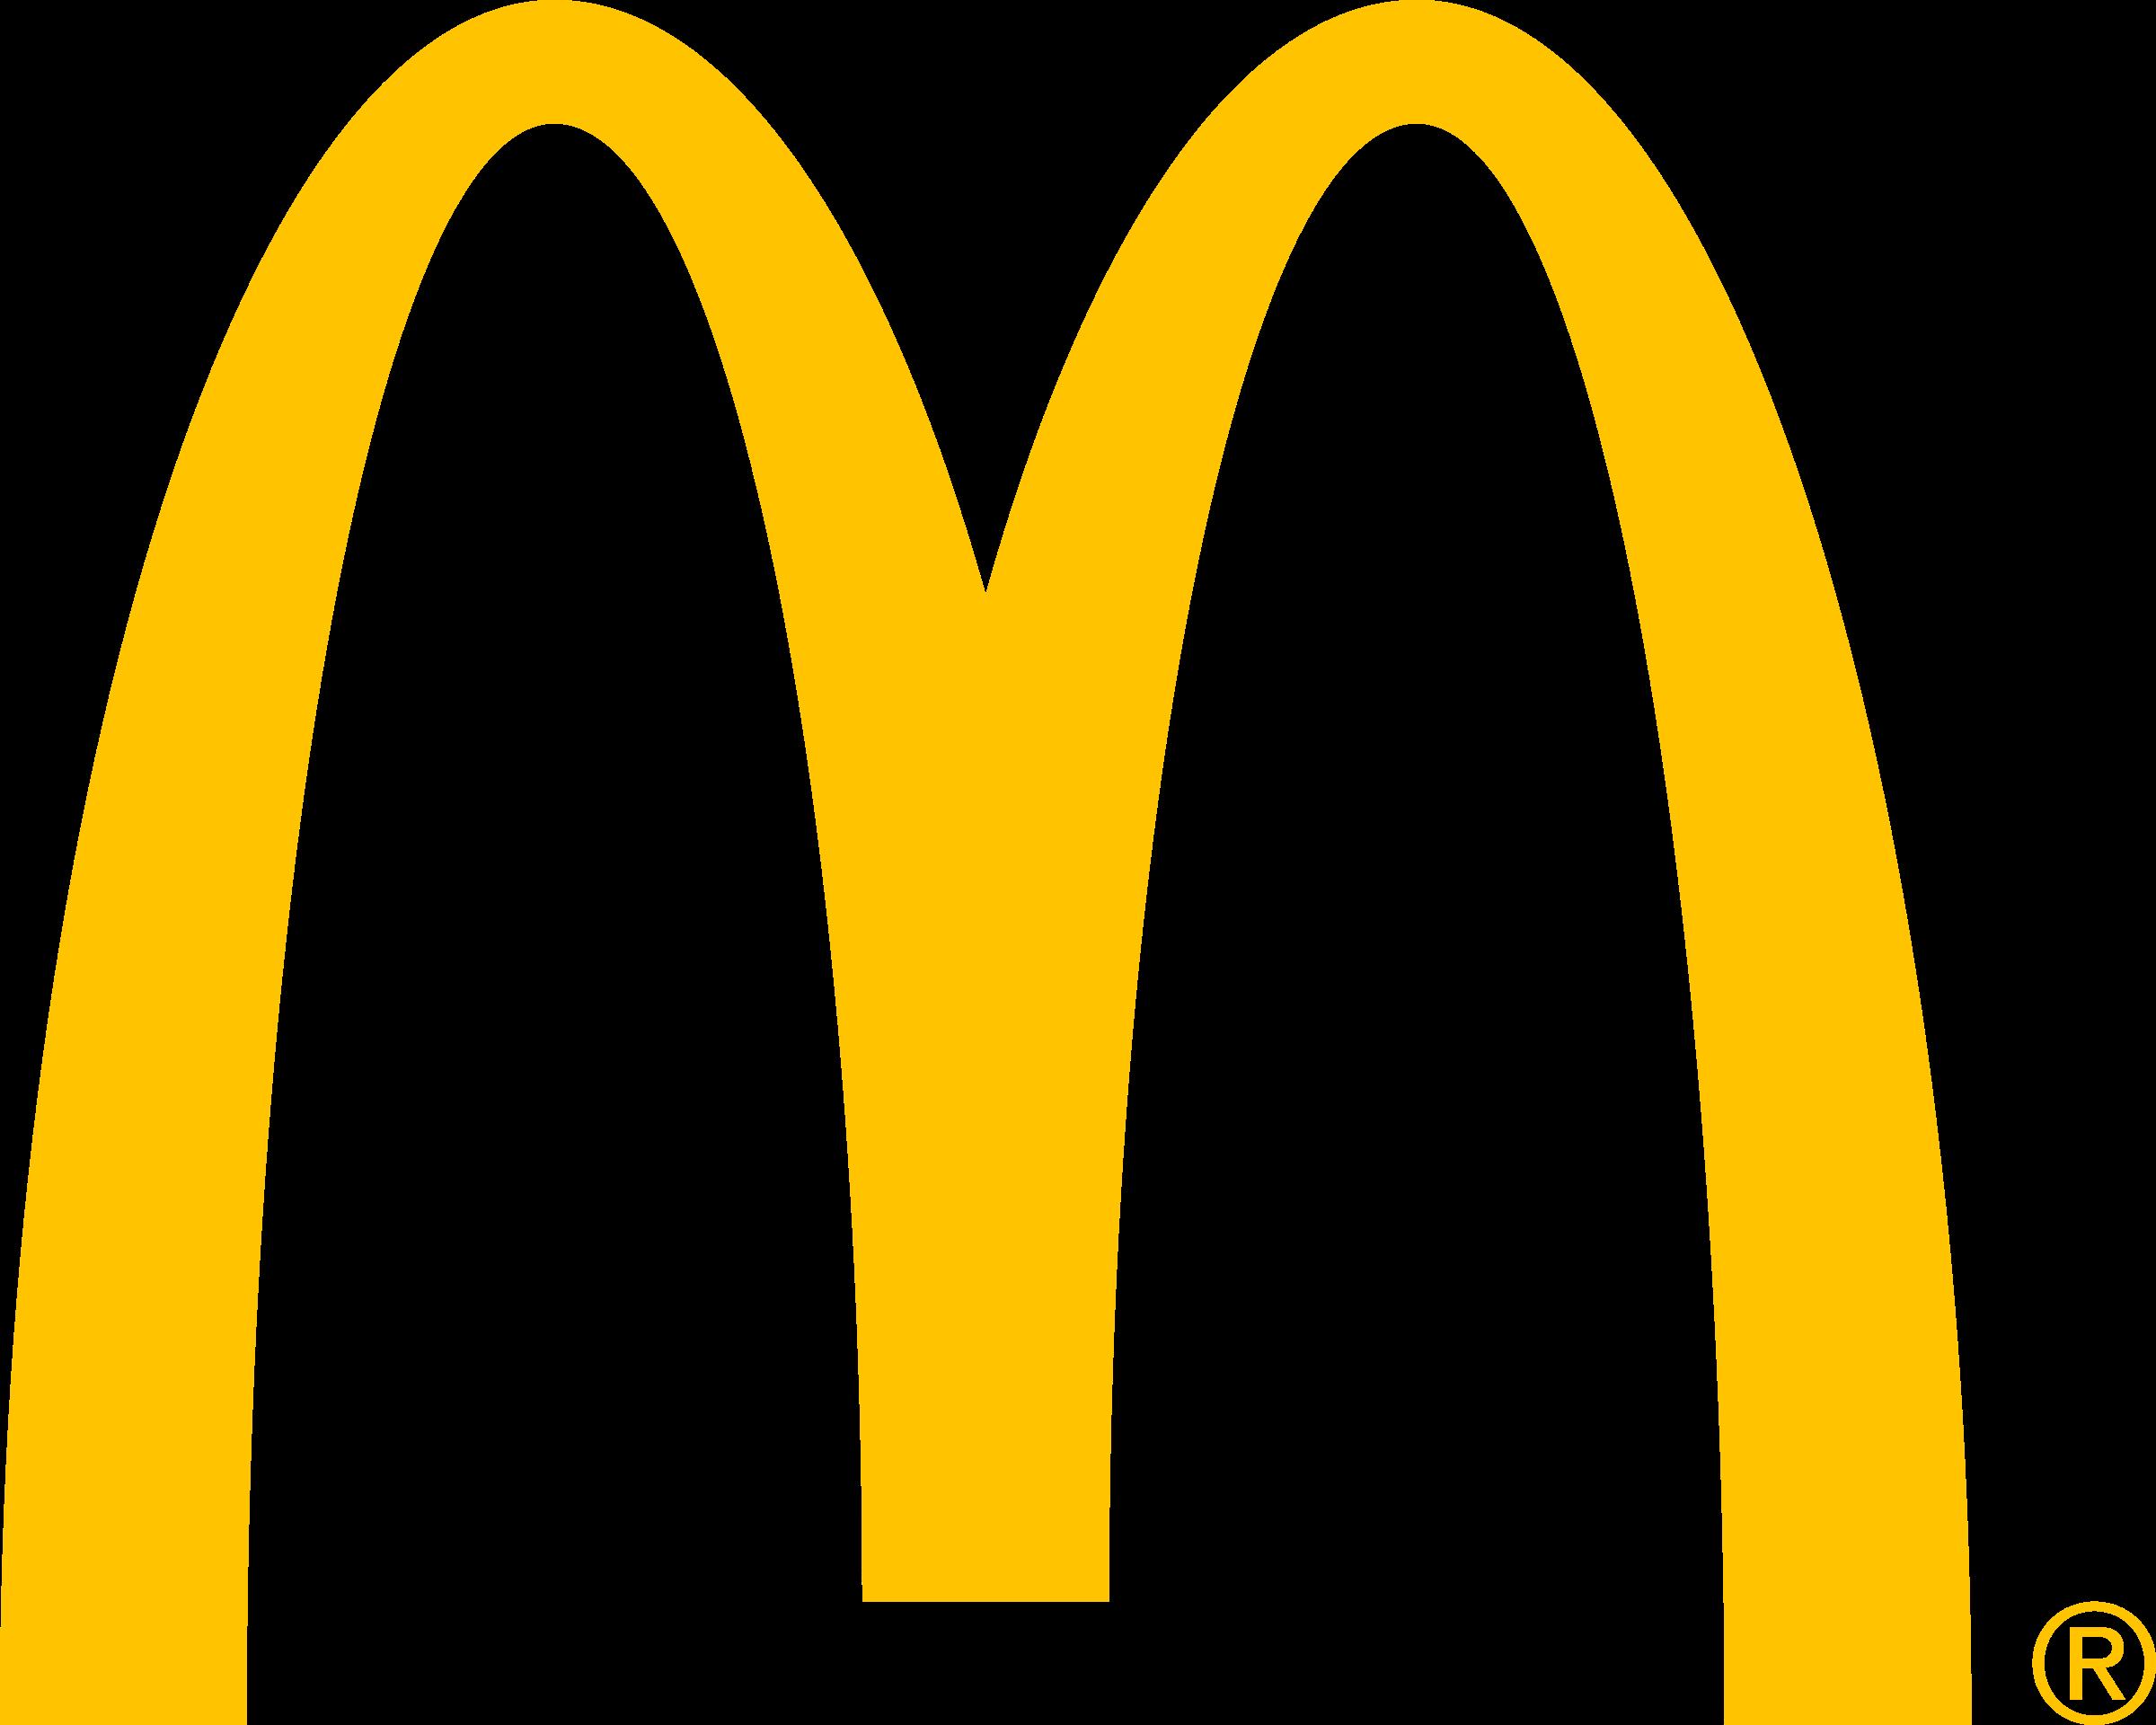 NO-logo-mcdonalds